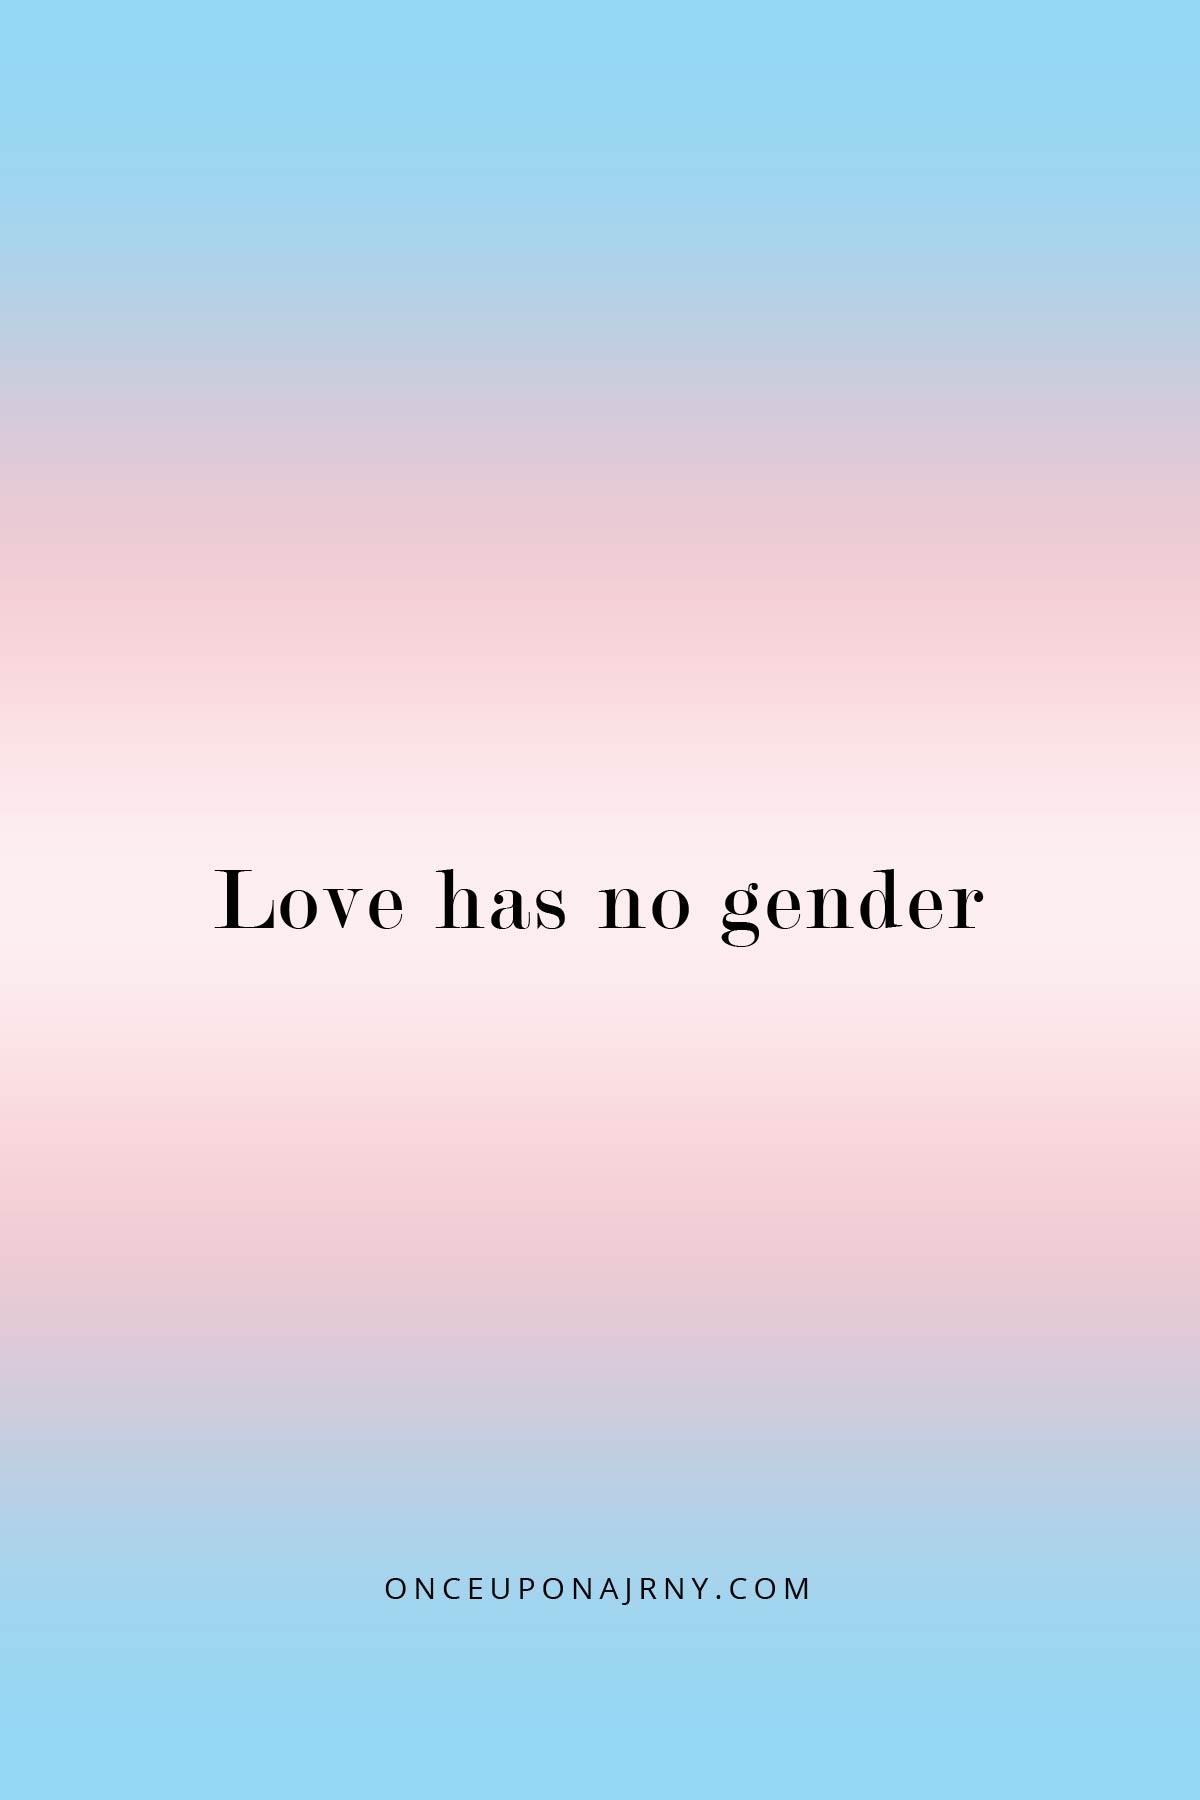 Love has no gender lgbtq quotes